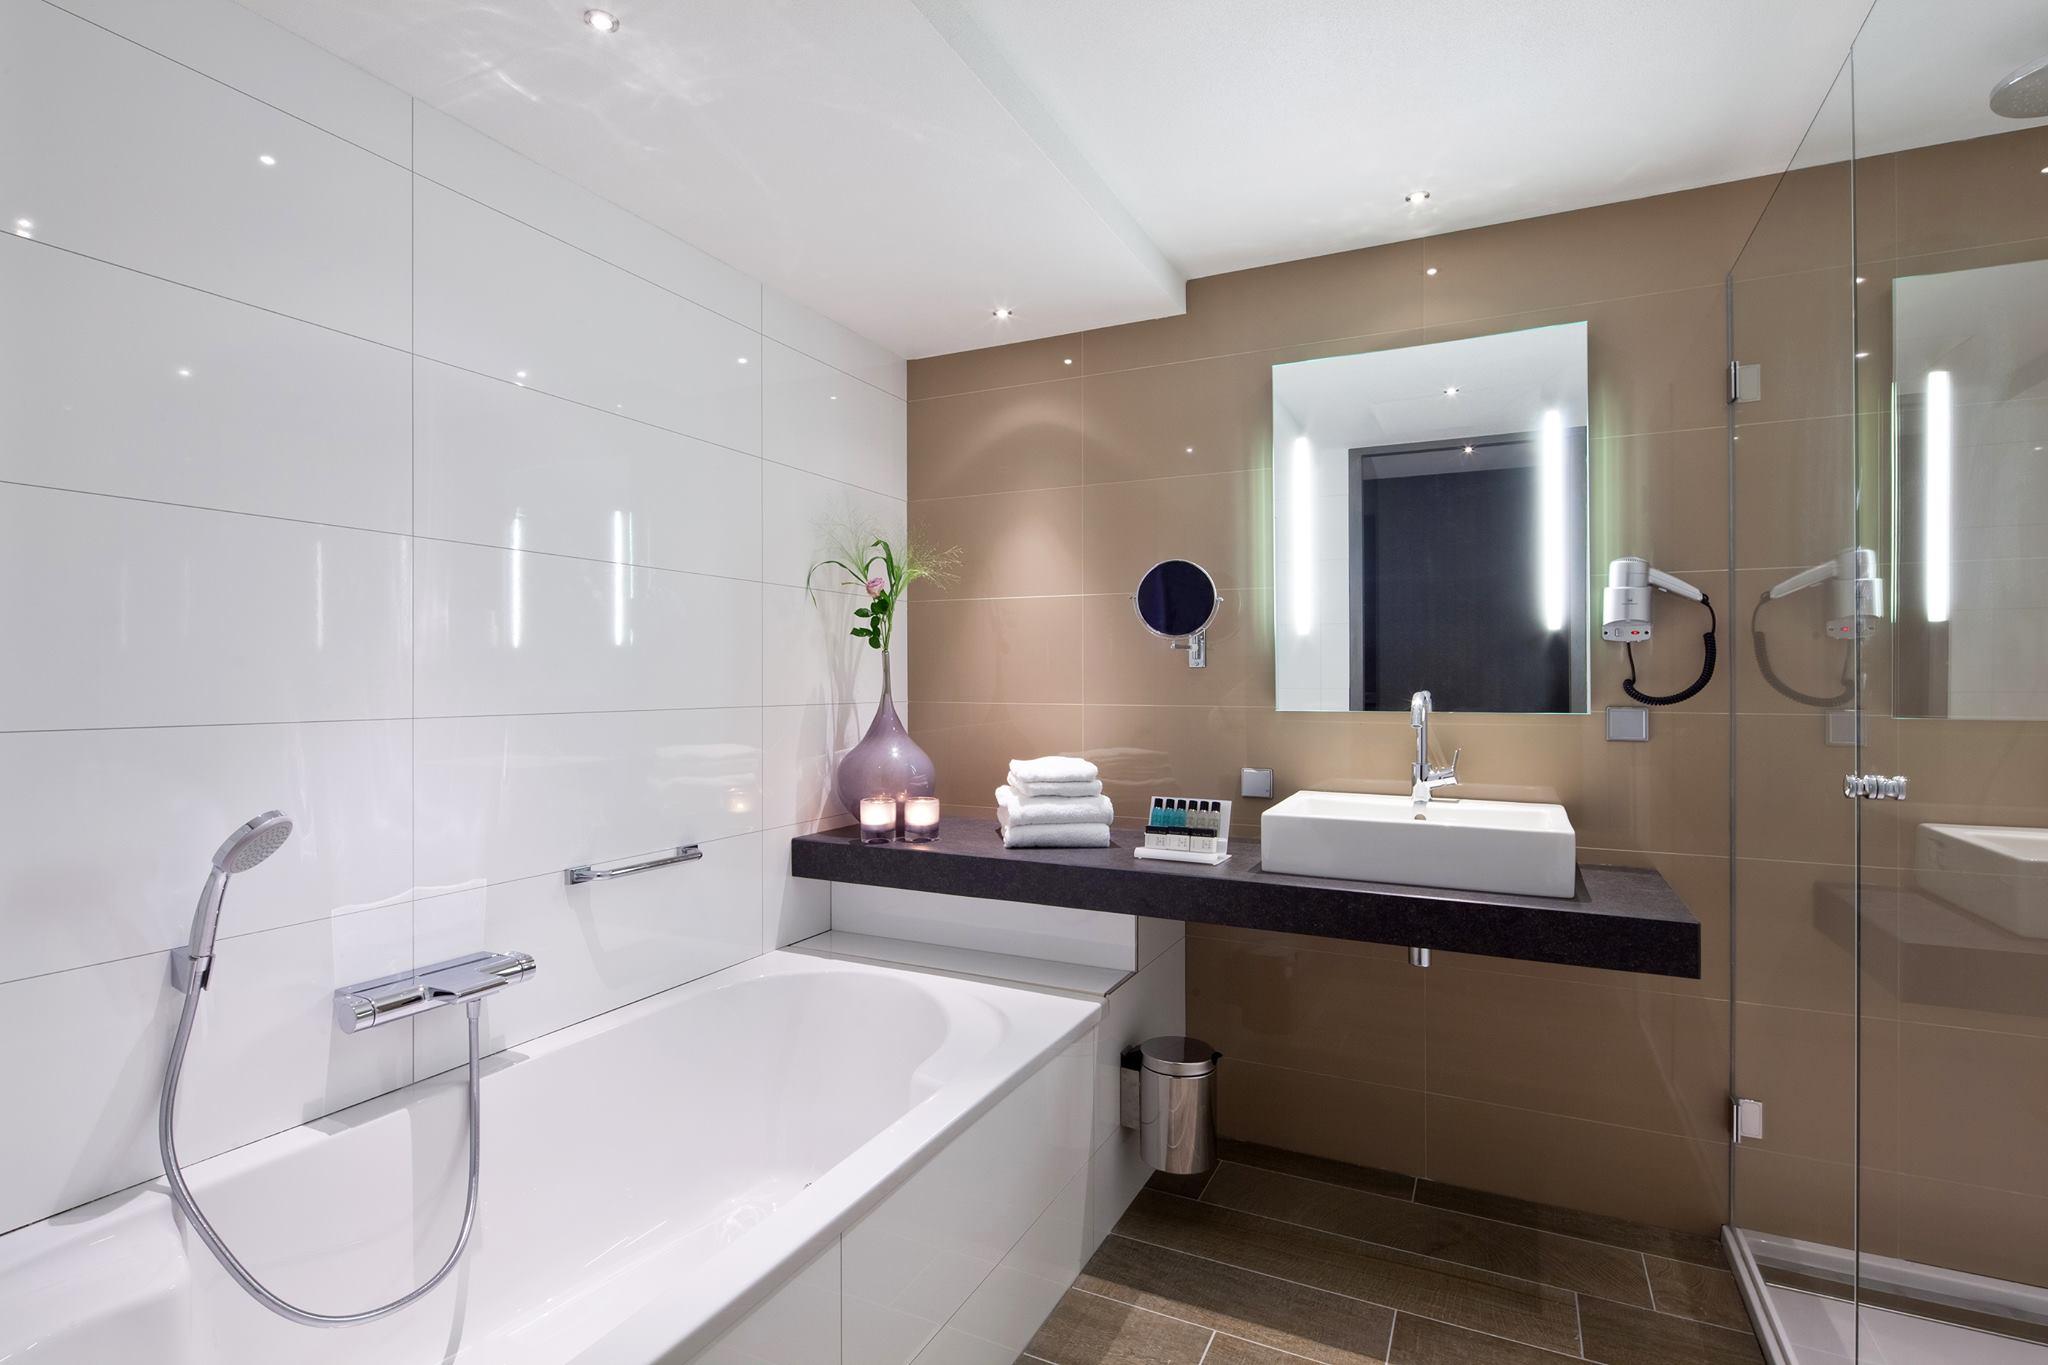 asselux linnenbecker gmbh baustoffhandel fliesenhandel holzhandel. Black Bedroom Furniture Sets. Home Design Ideas